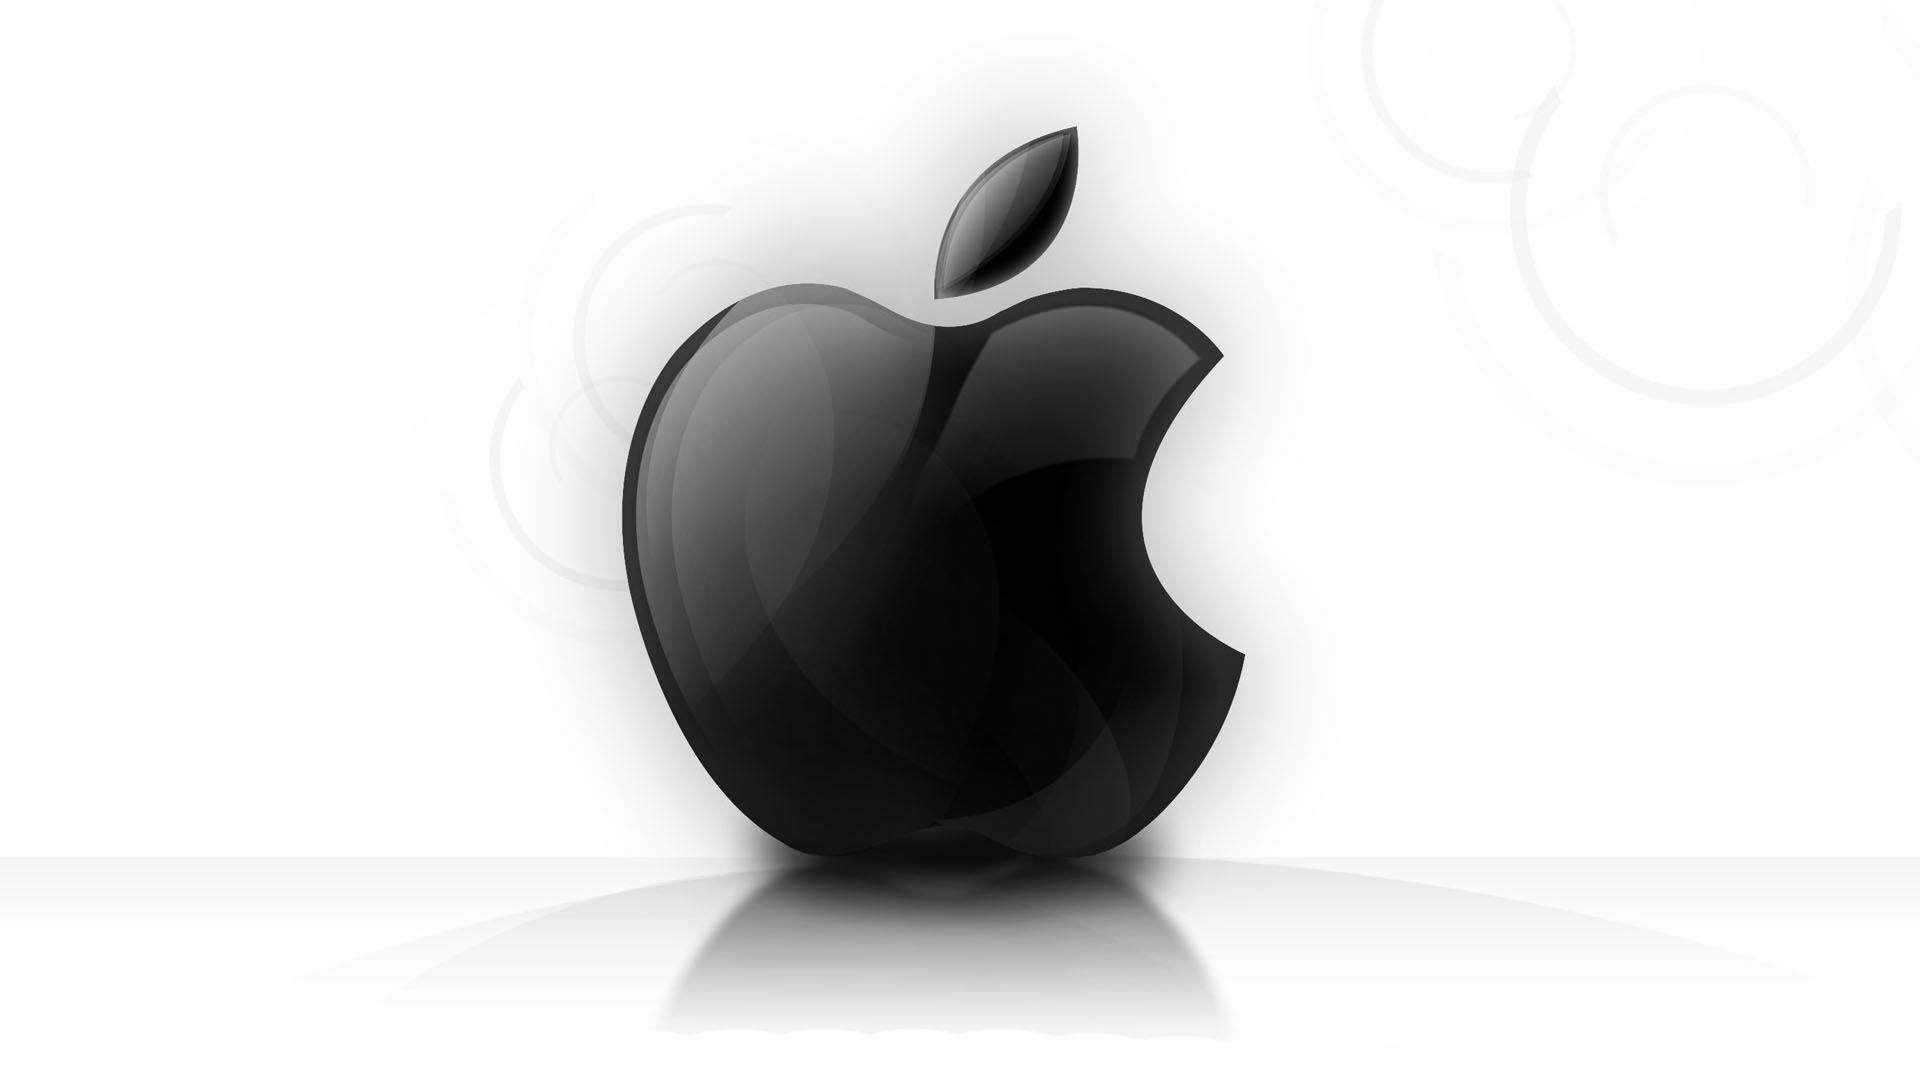 Apple Logo Wallpaper Hd 1080p 1